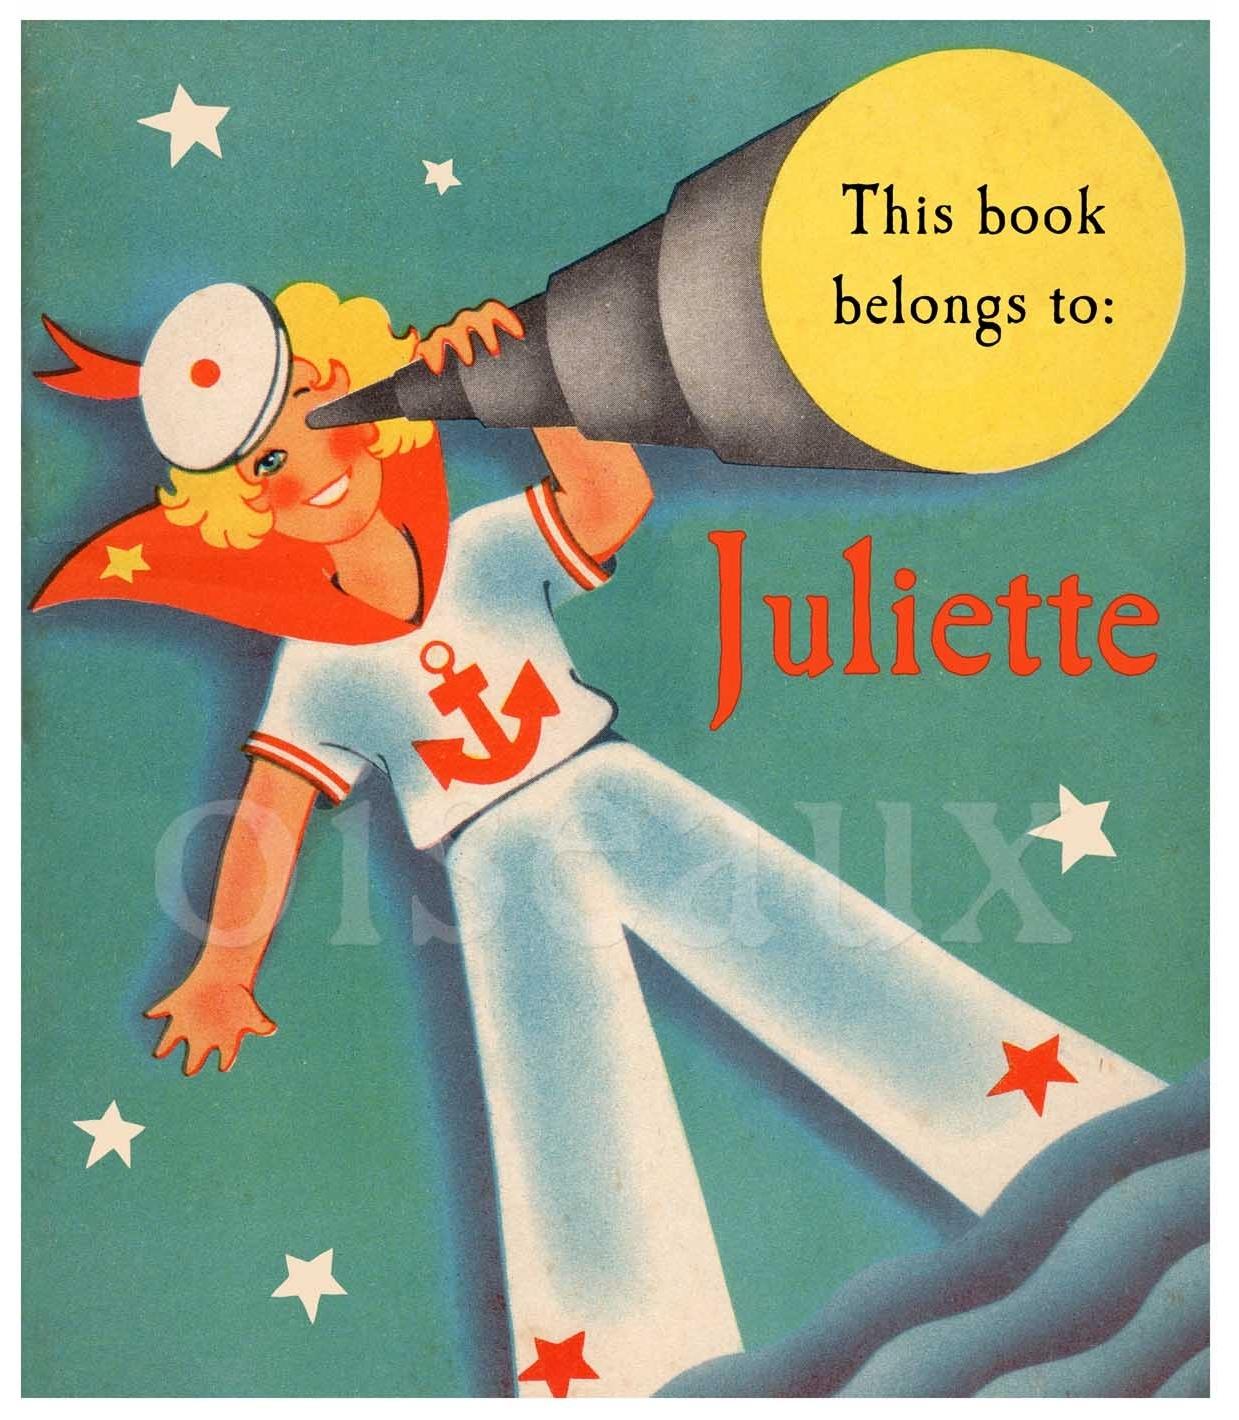 Sailor Girl bookplates